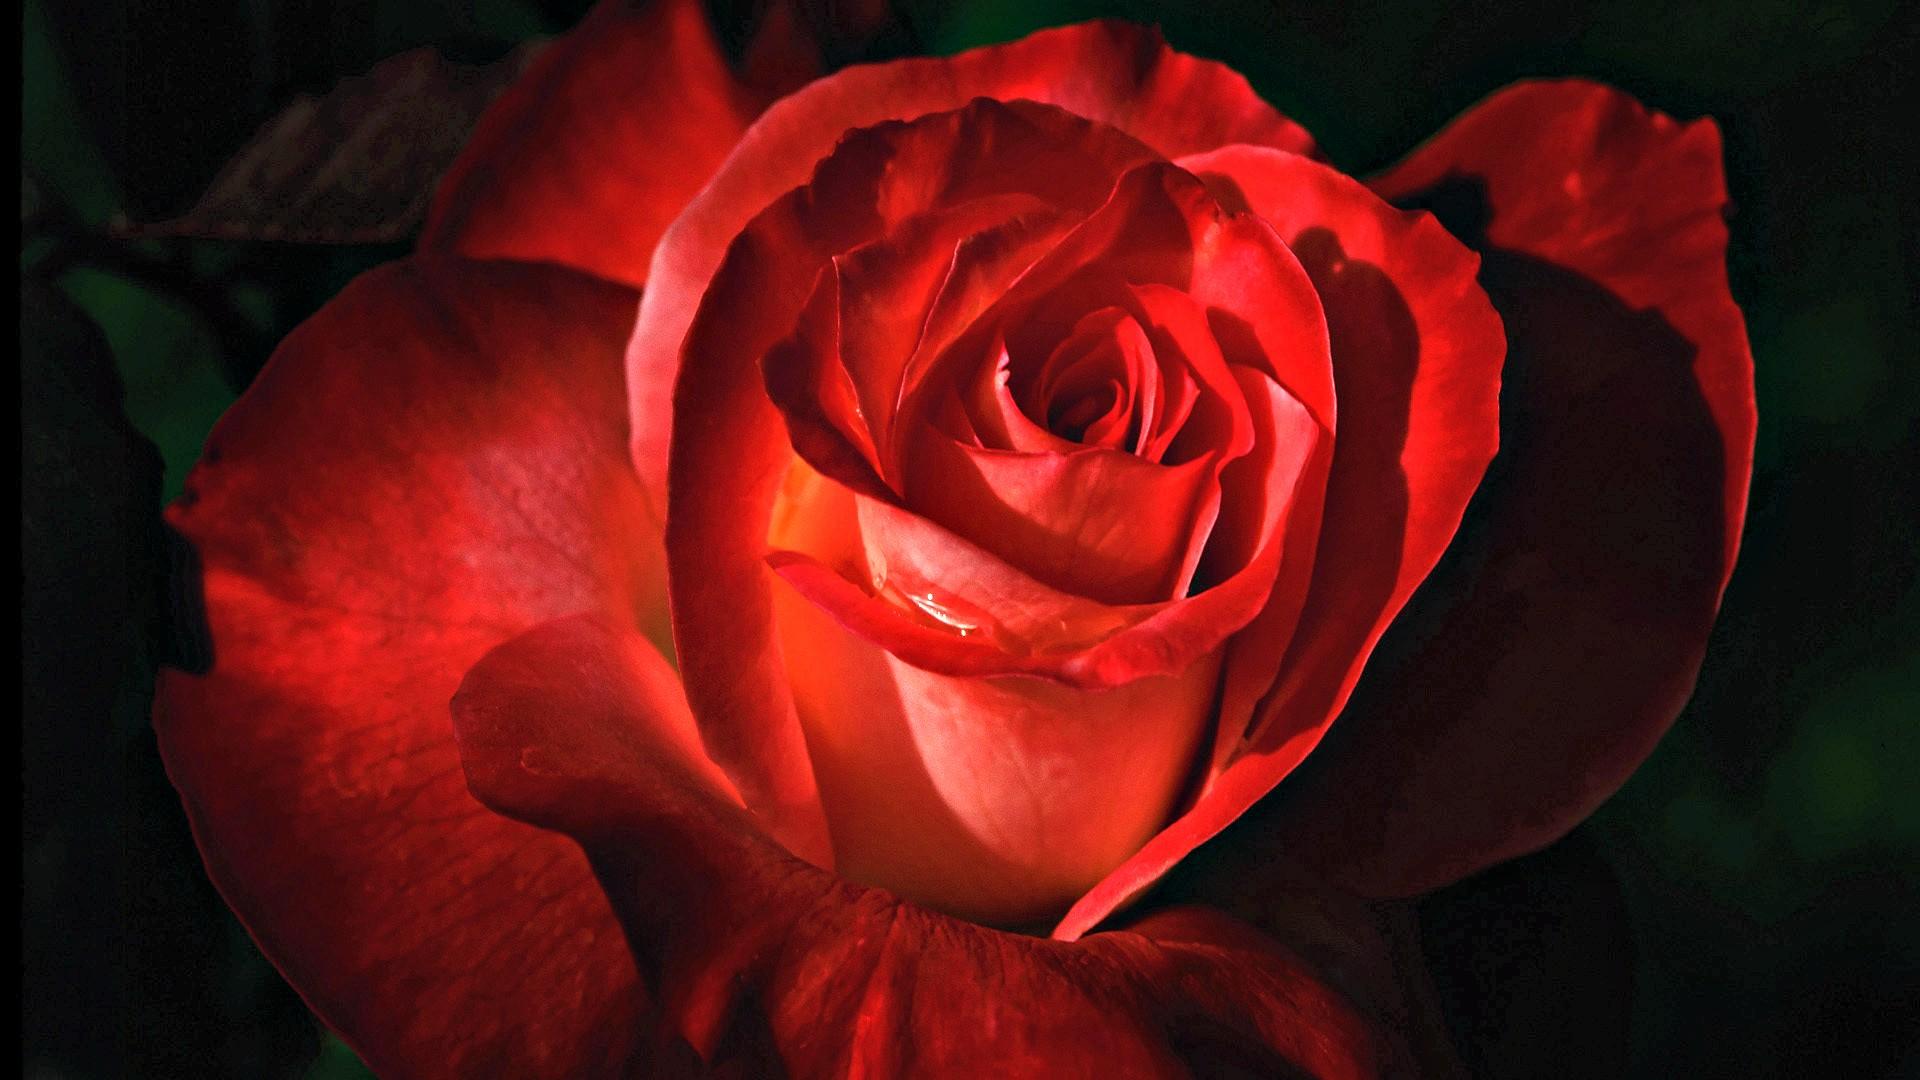 Day Macro Photography Beauty Red Flowers Valentines - Piękna Czerwona Róża , HD Wallpaper & Backgrounds